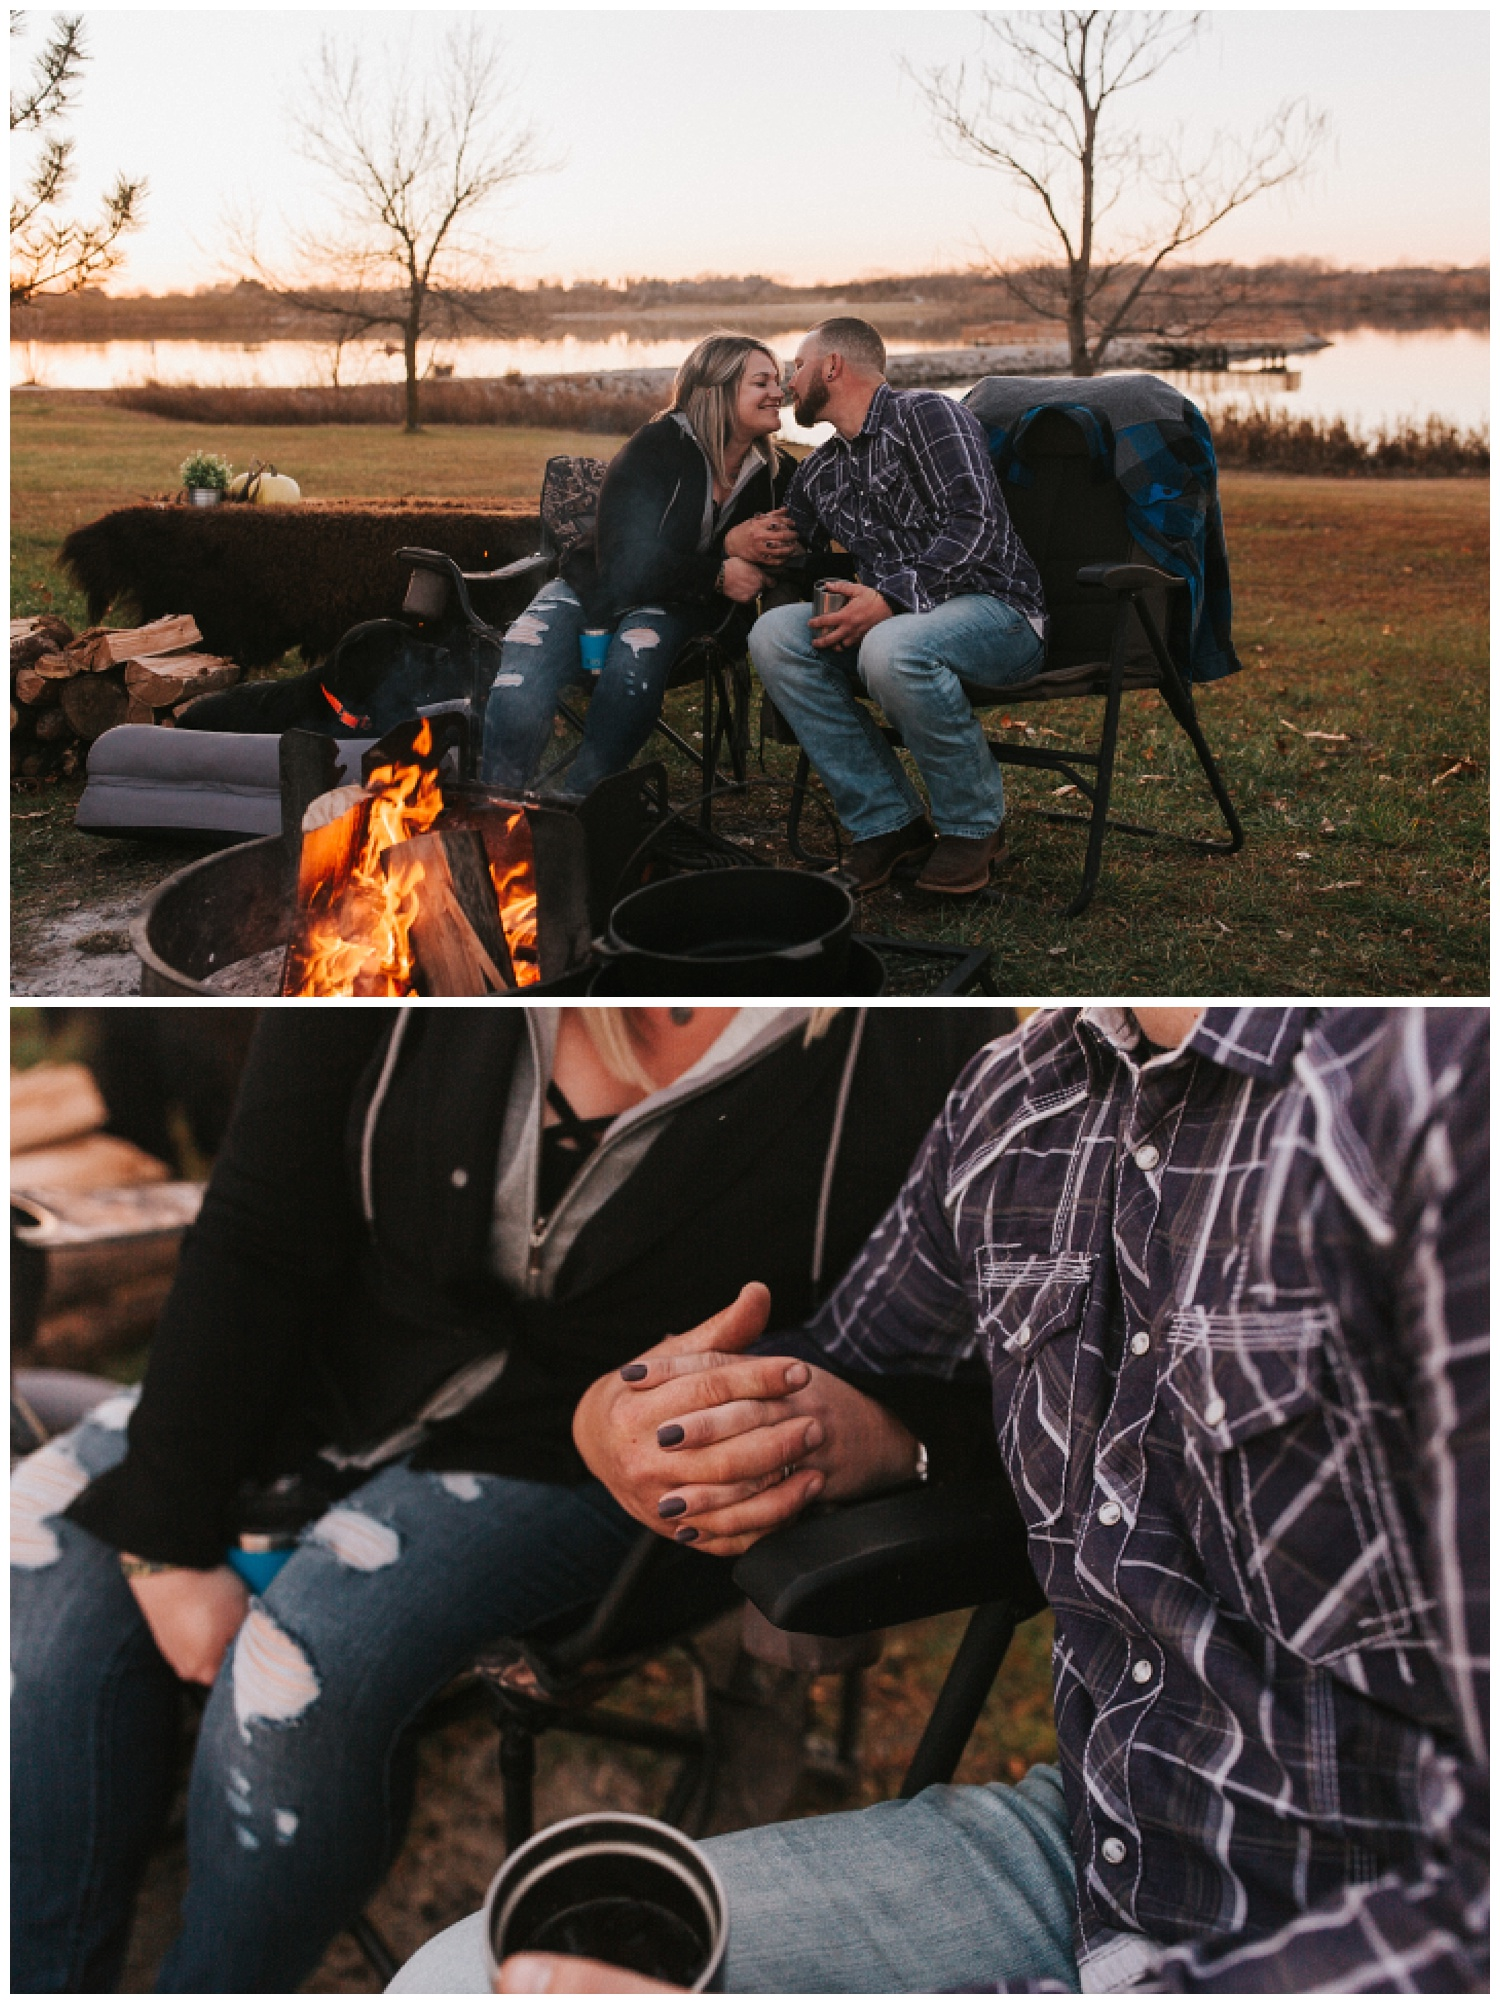 cozy_campfire_campsite_engagement_anniversary_session_nebraska_photographer_haley_chicoine_adventureous_wedding_0025.jpg